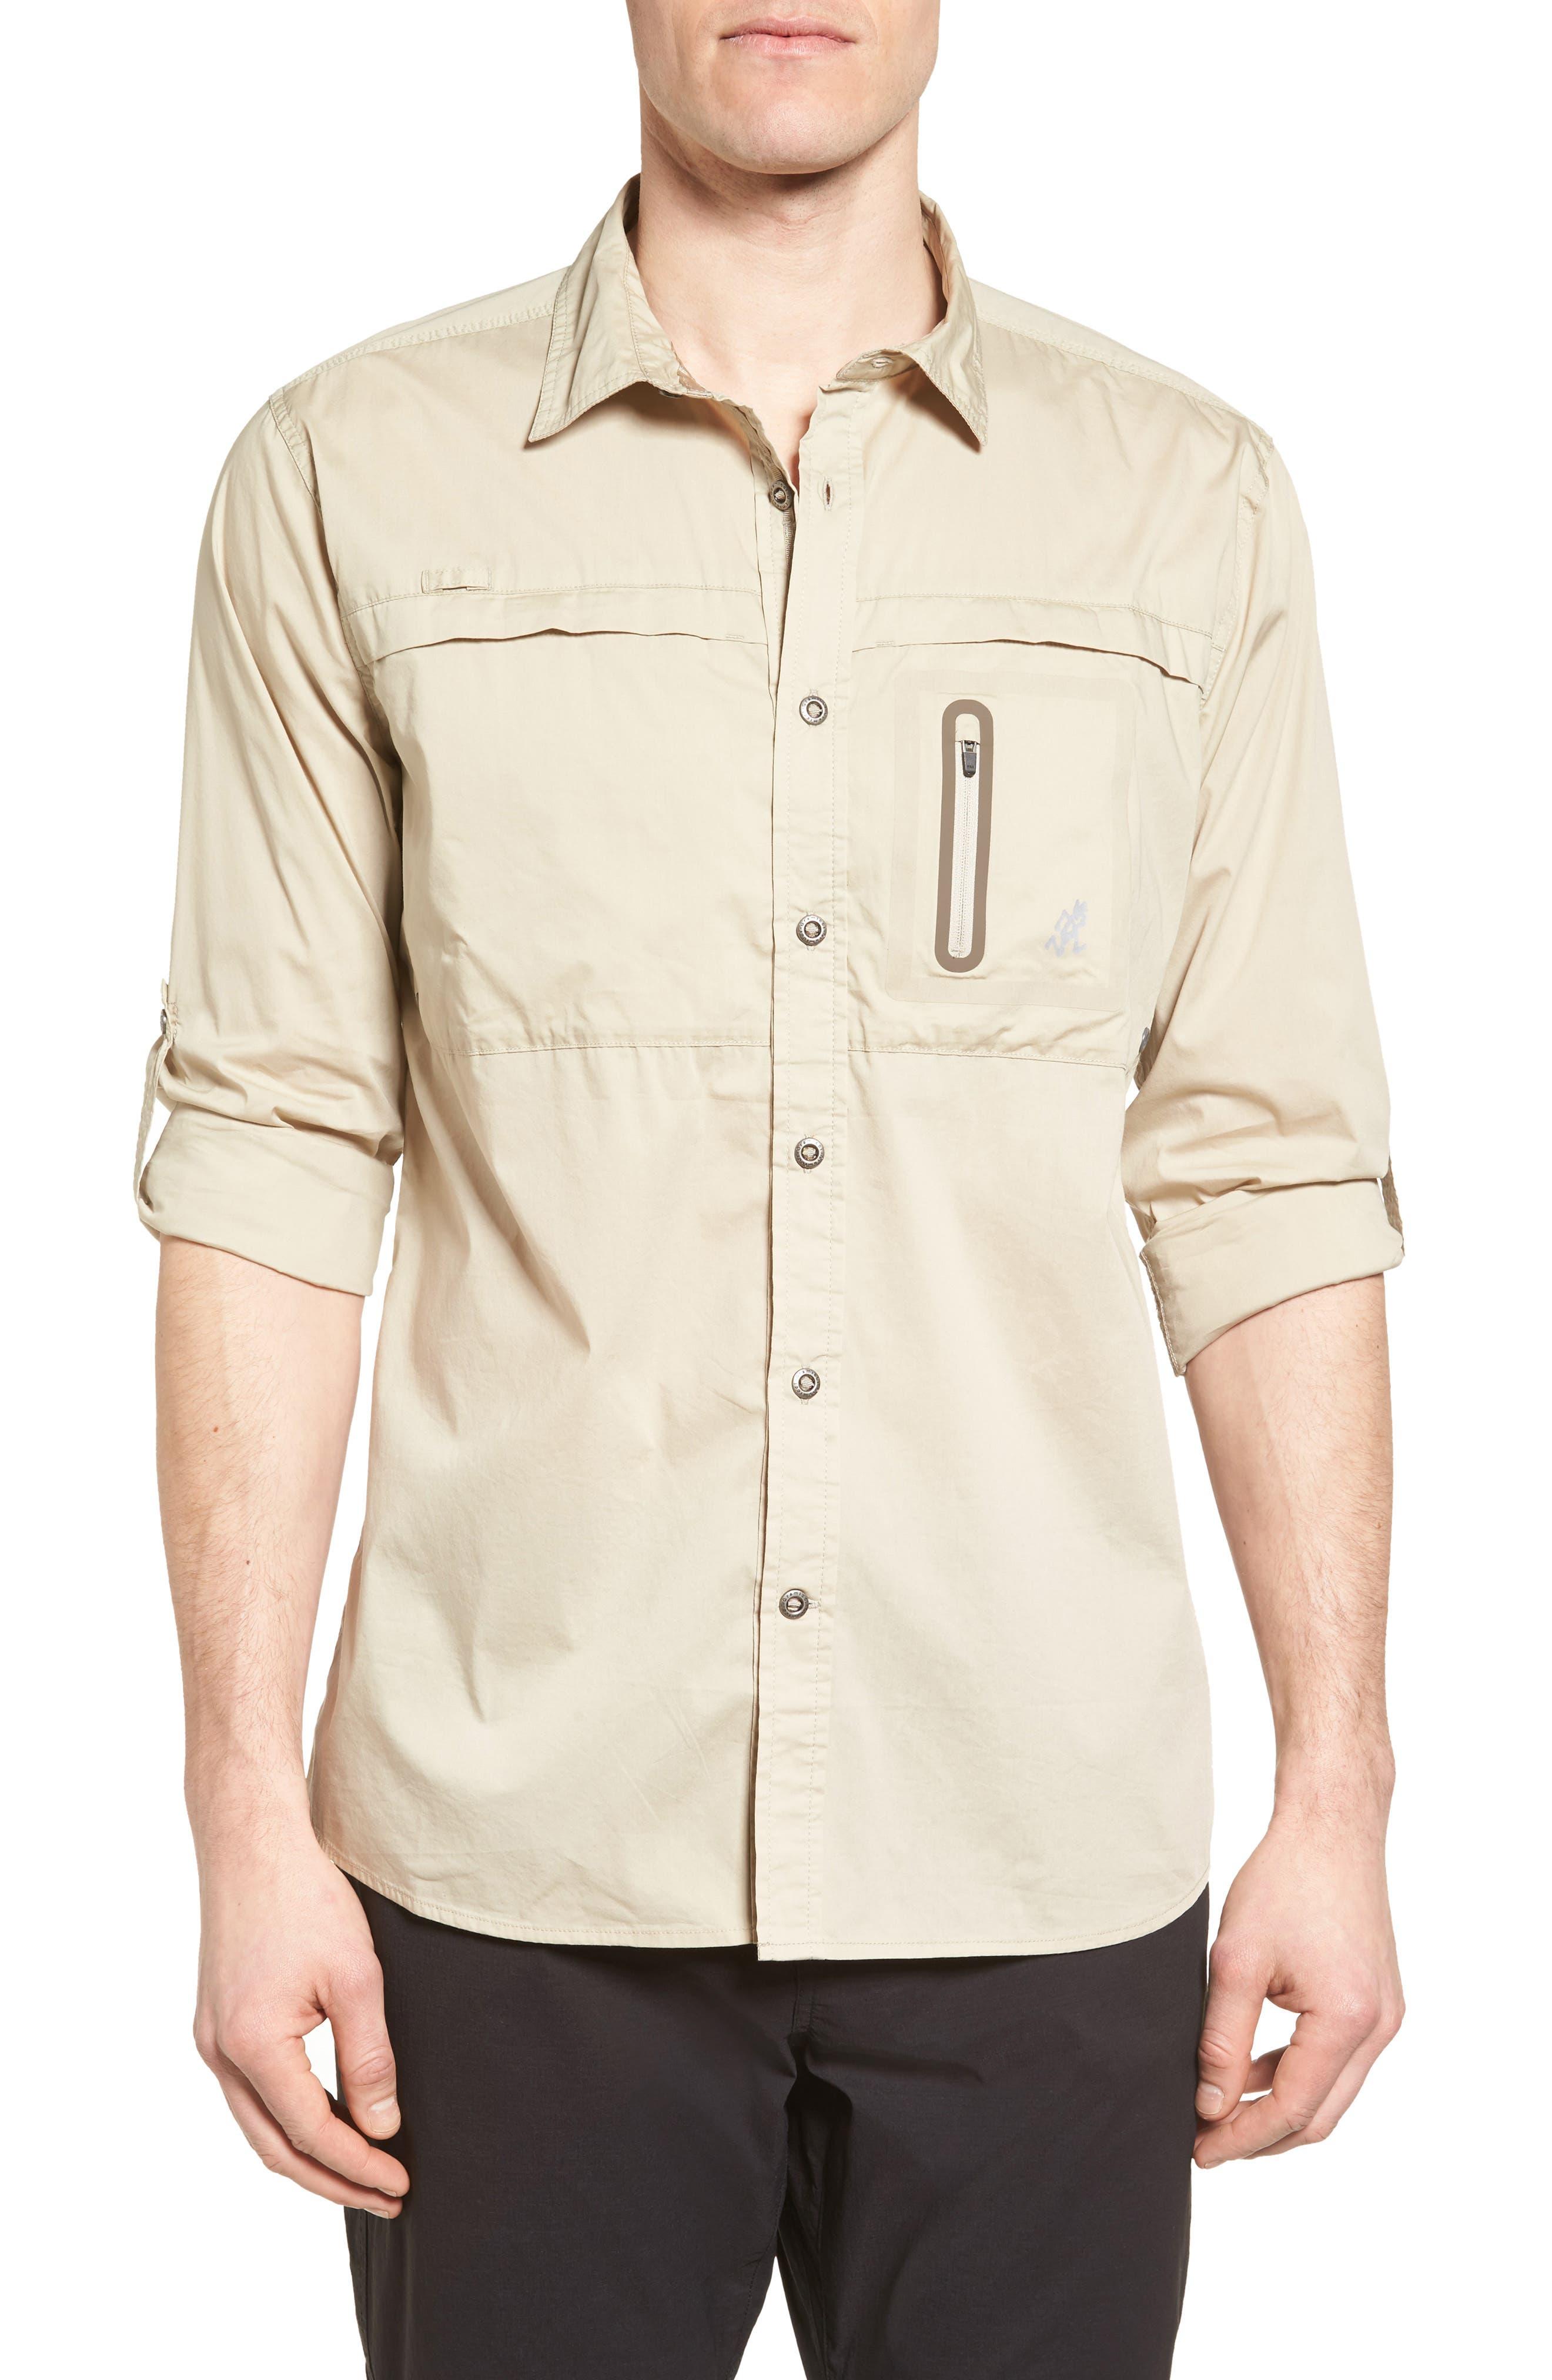 Main Image - Gramicci NO-Squito Regular Fit Travel Shirt